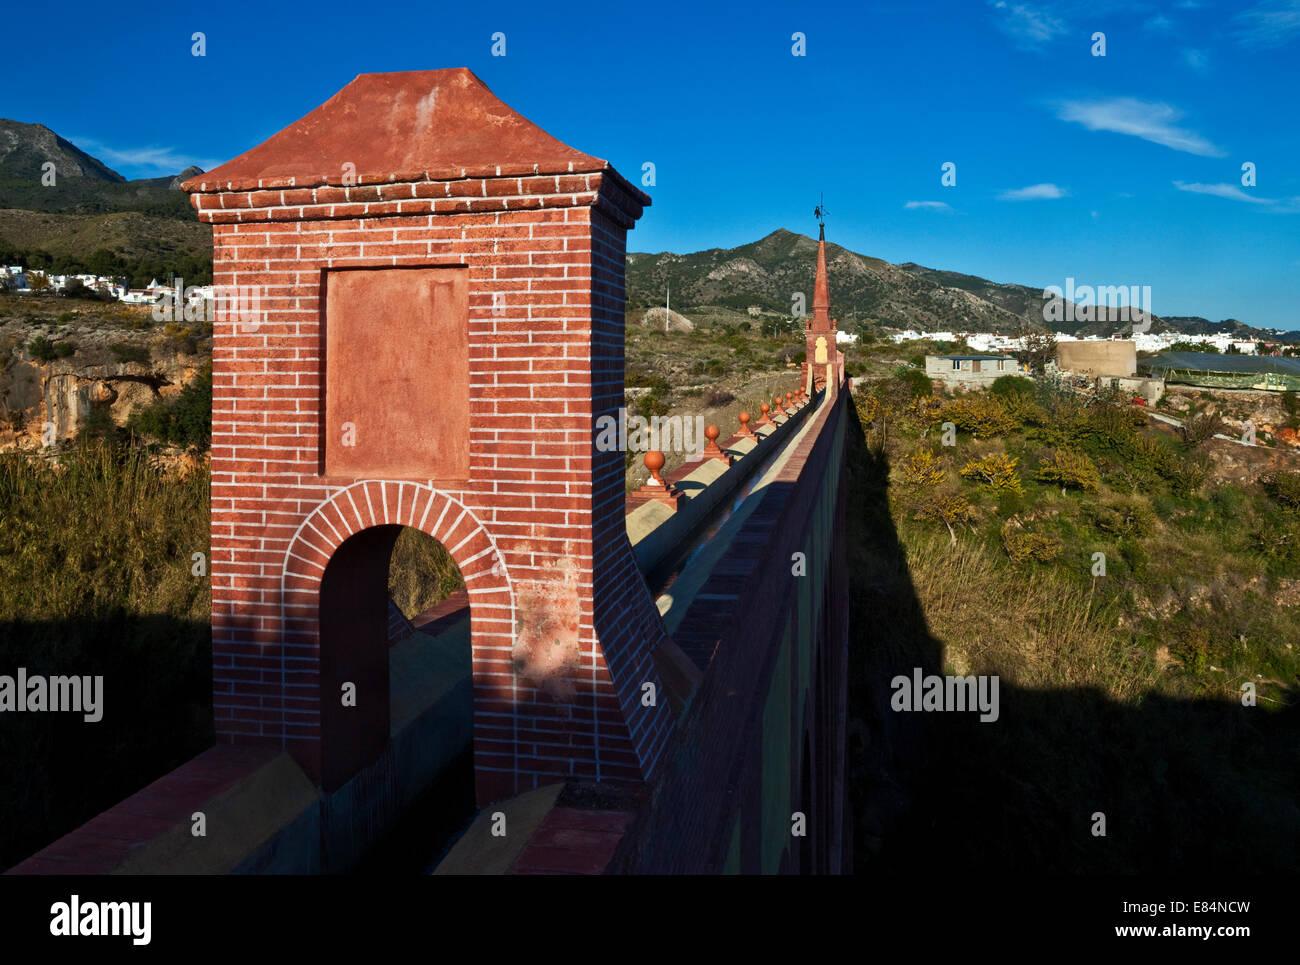 19th C Eagle Water Aqueduct (Acueducto del Águila),  Between Nerja, Costa del Sol, Malaga Province, Andalucia, - Stock Image